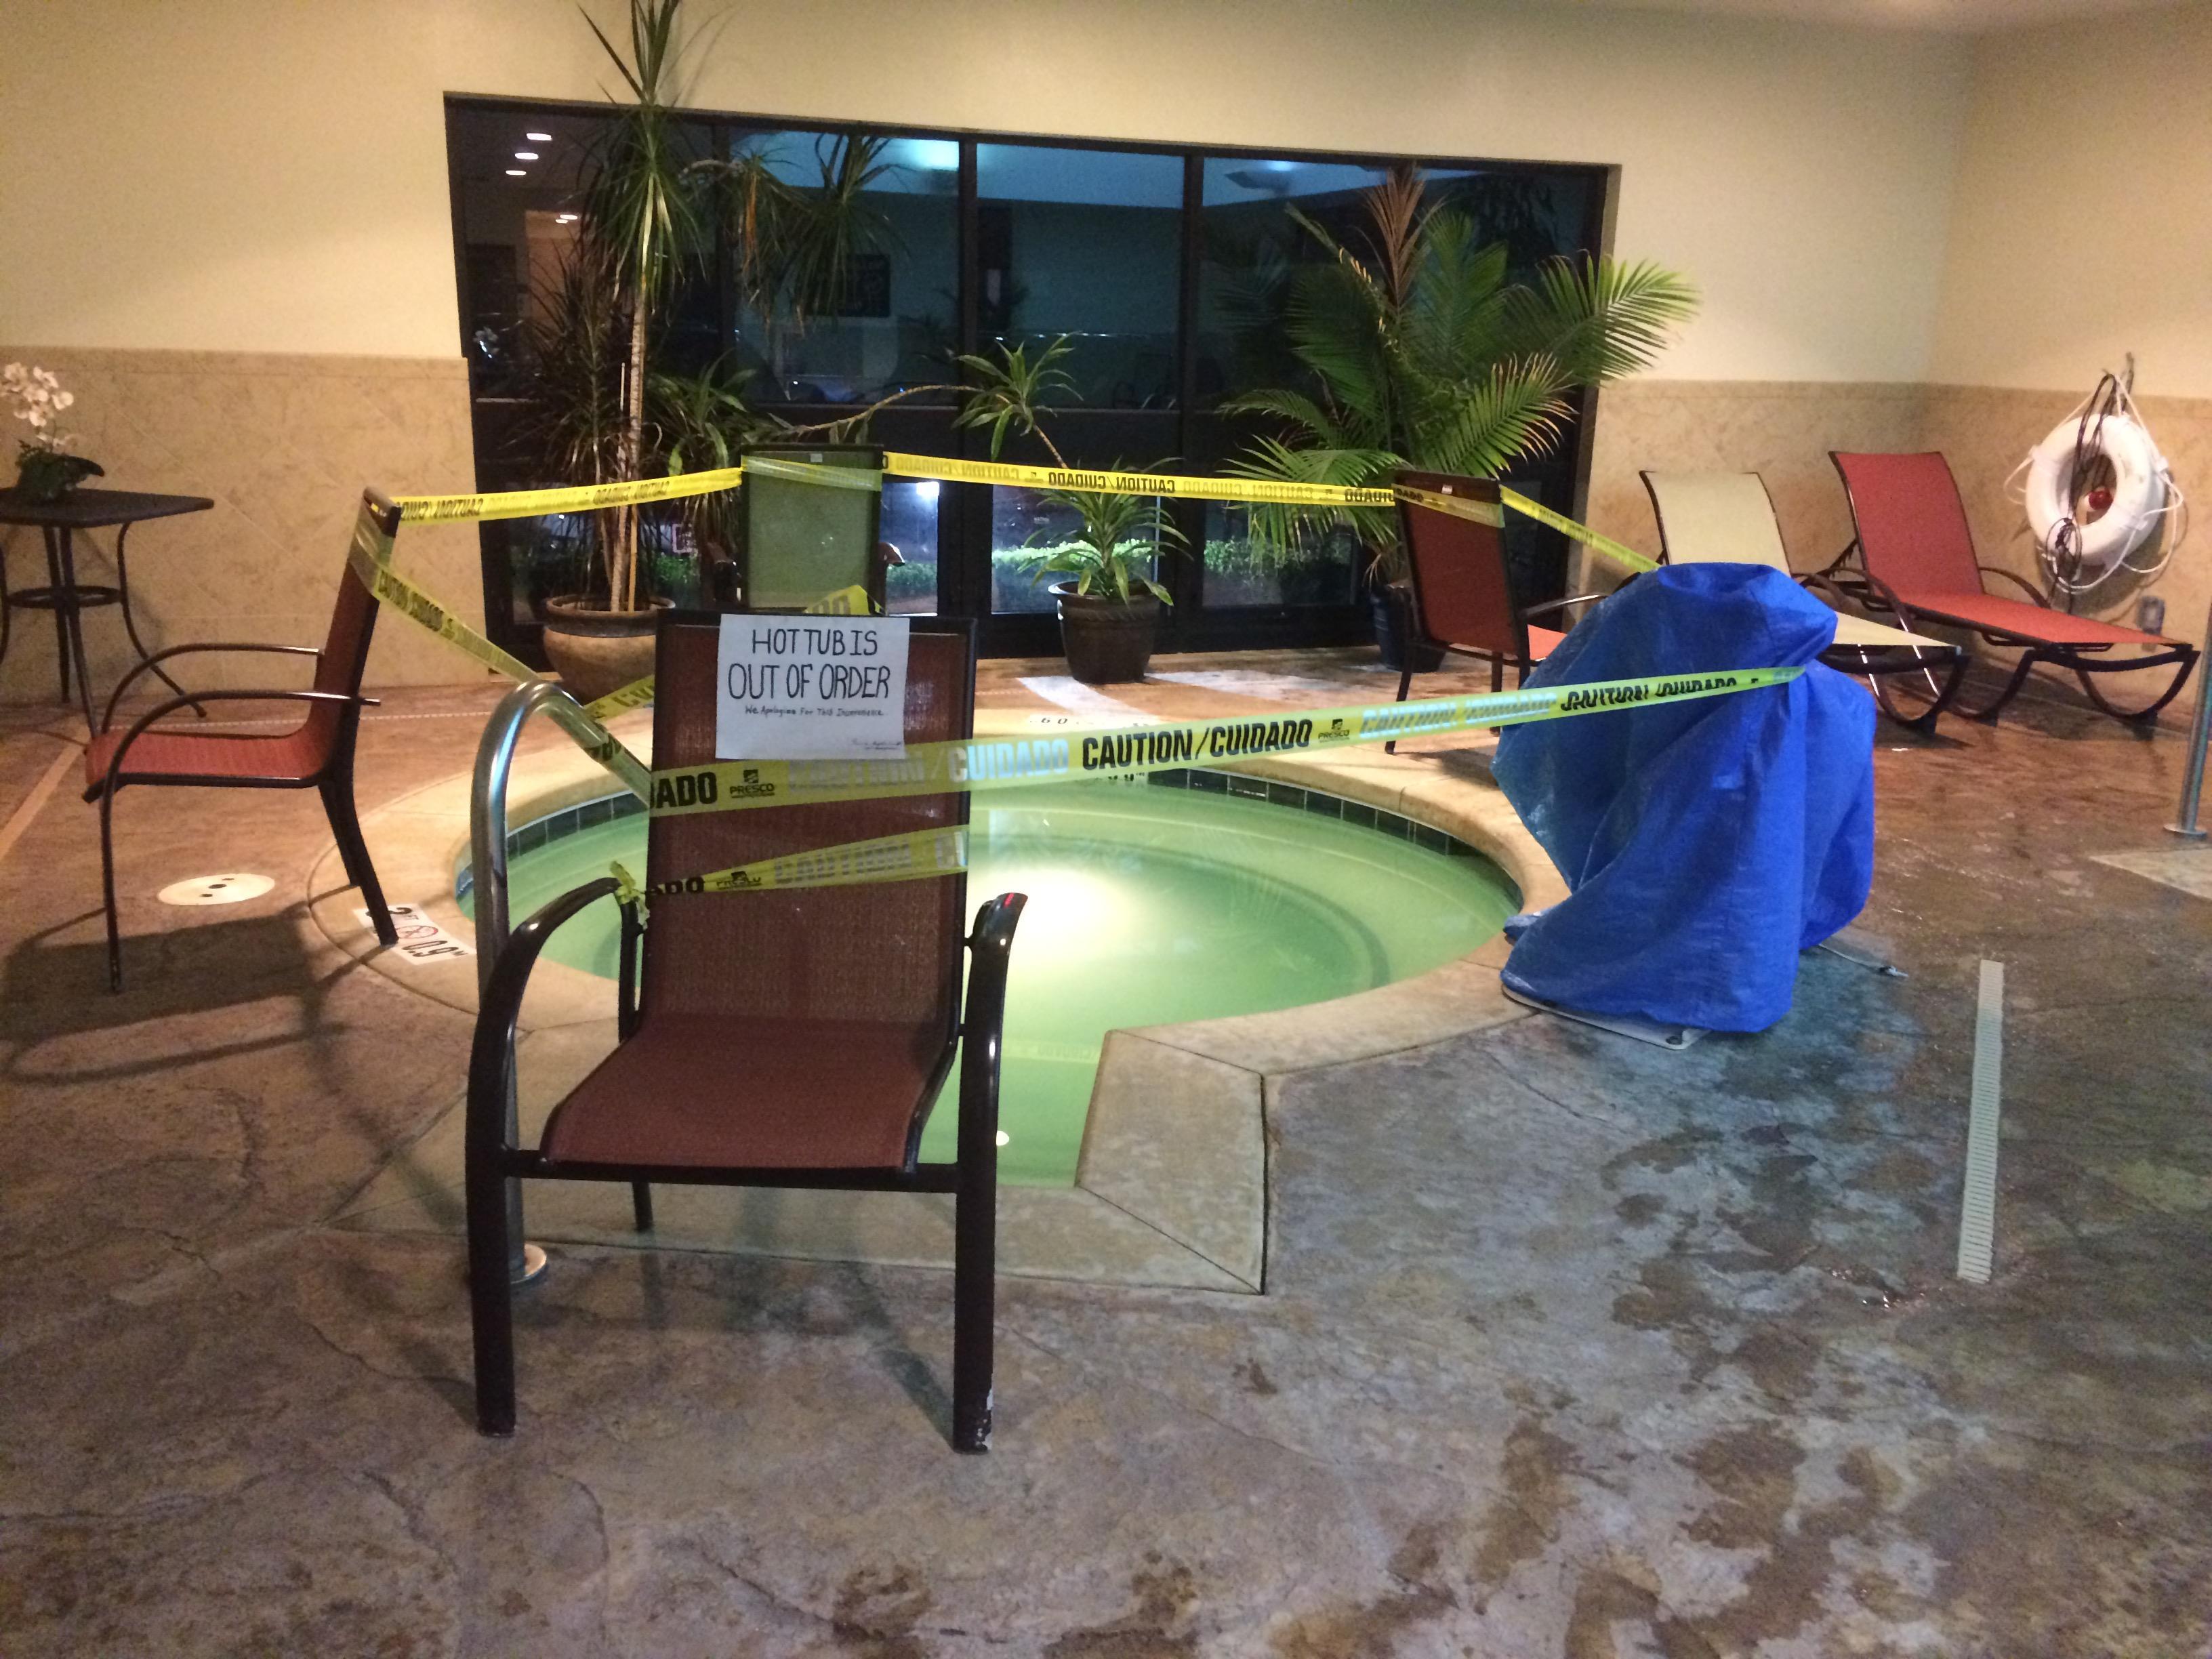 Nice pool - open until midnight